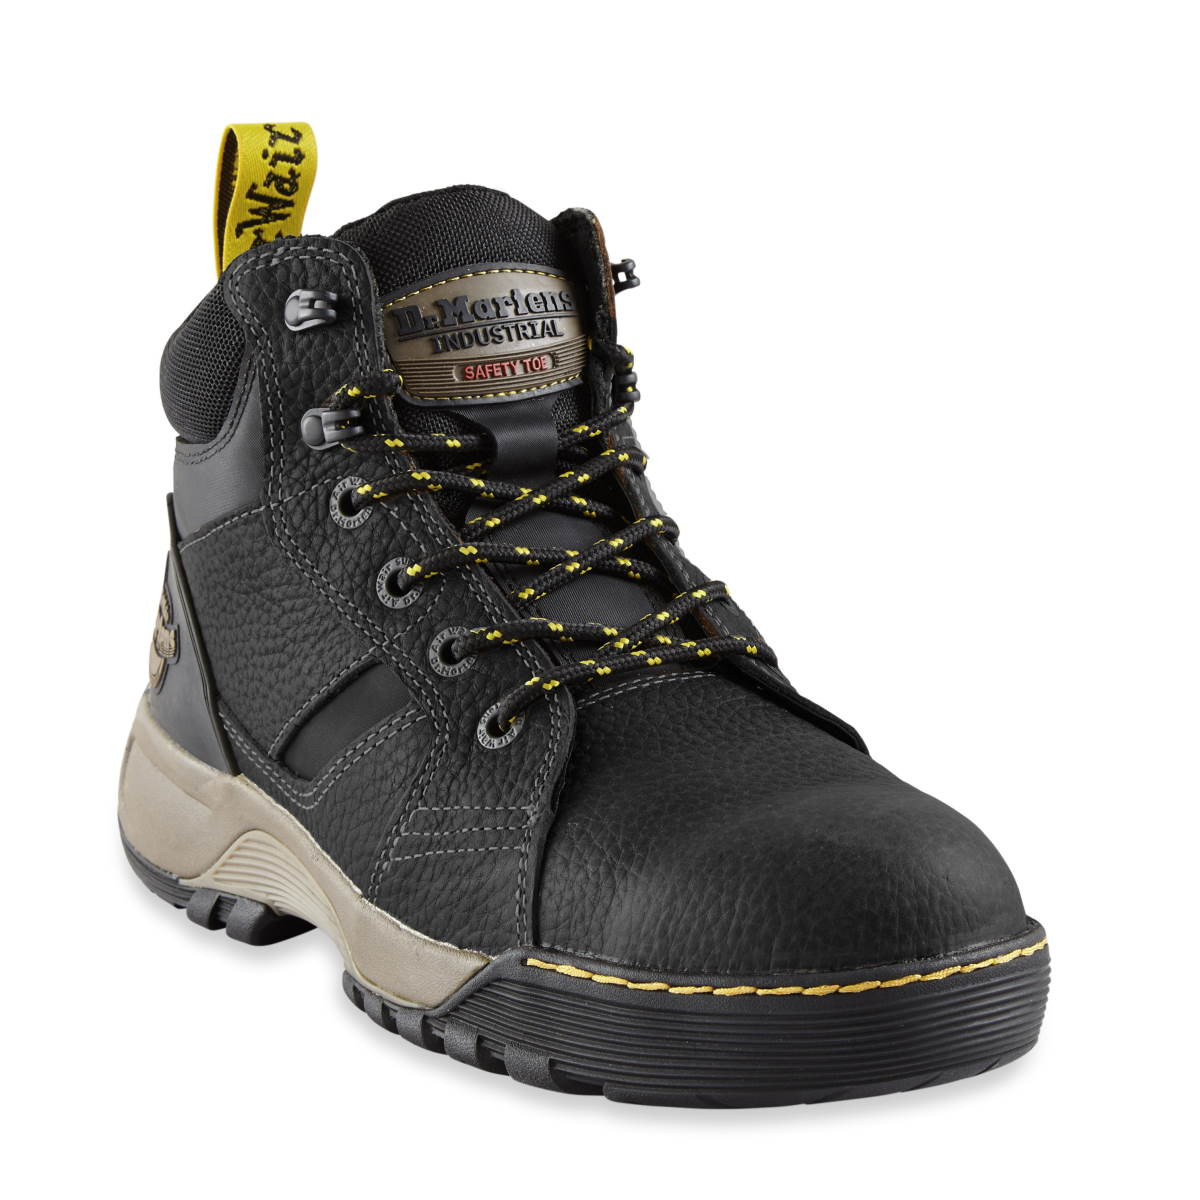 SF6905 Dr Martens Riverton Safety Chukka Boot_Black